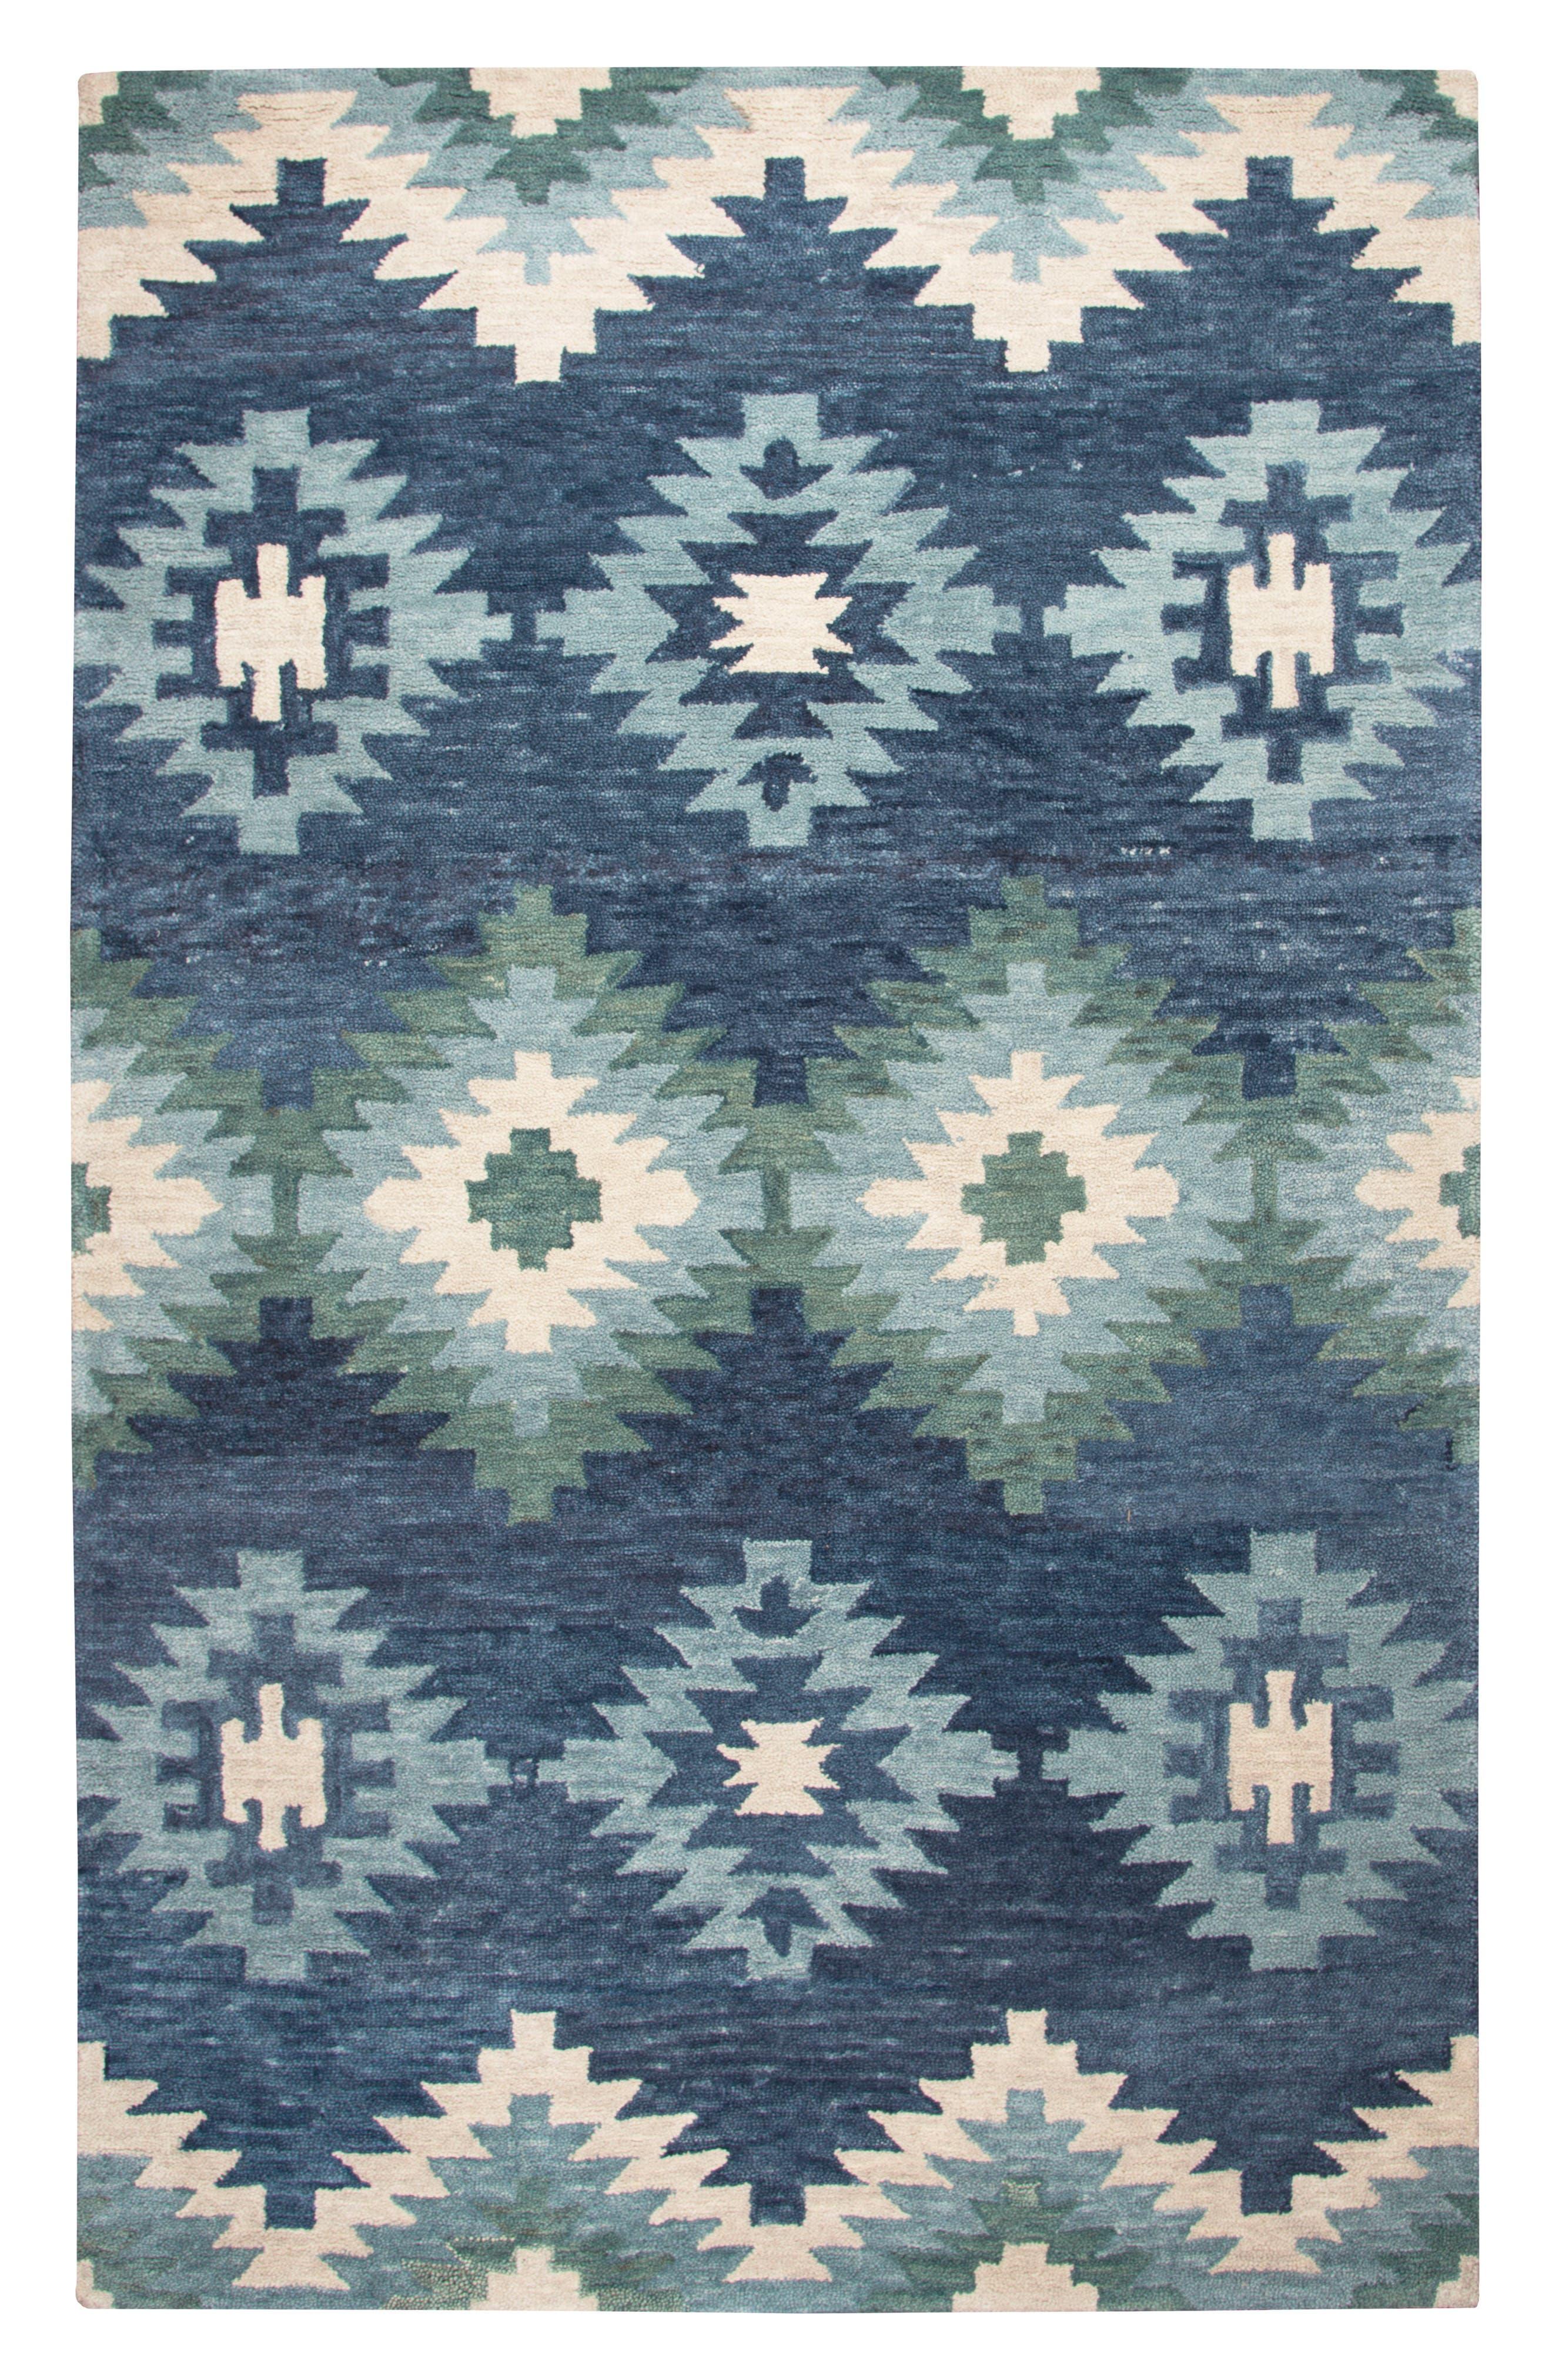 Taos Hand Tufted Wool Area Rug,                             Main thumbnail 1, color,                             400